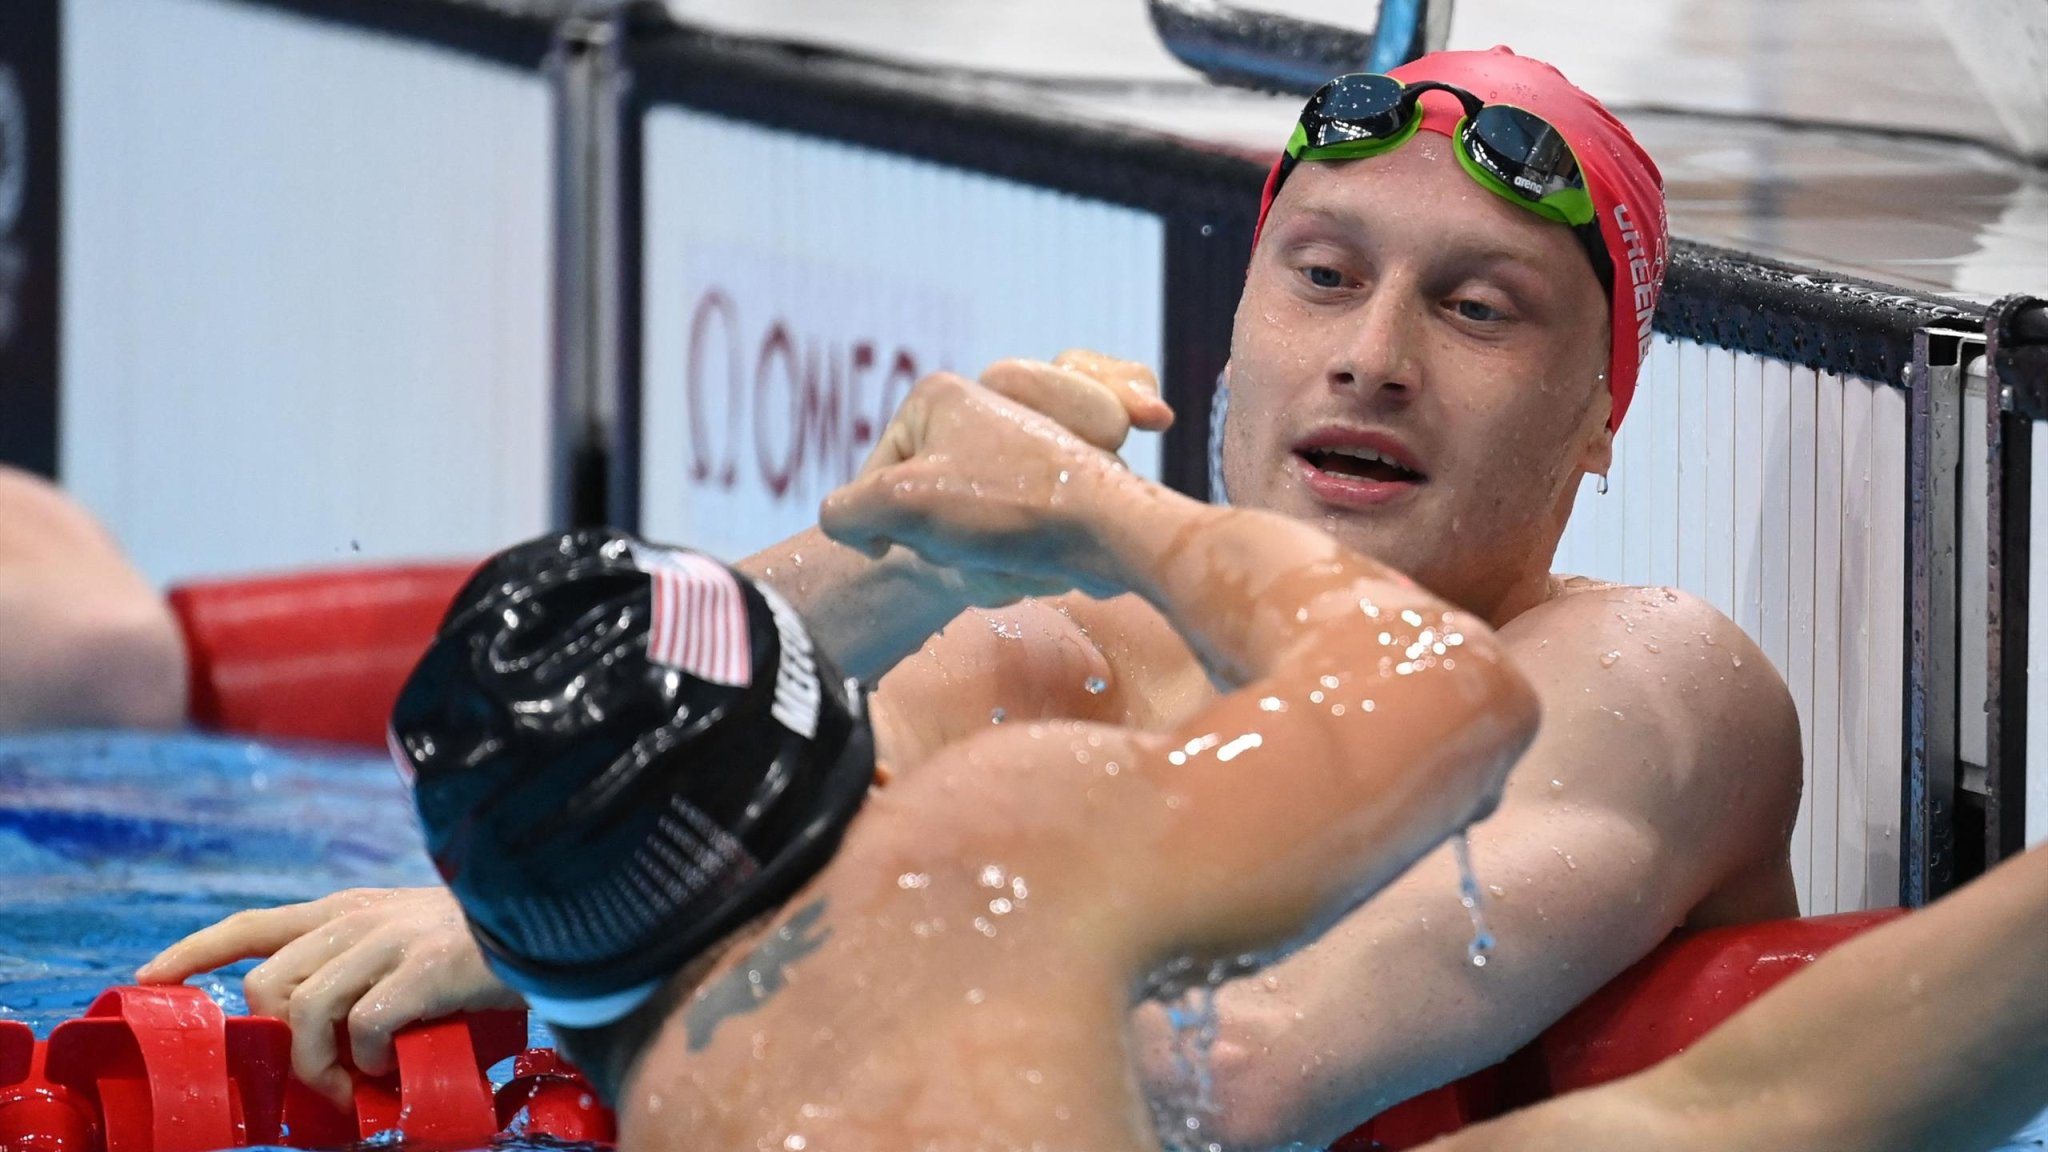 Tokyo 2020 - Luke Greenbank: Team GB swimmer wins bronze in 200m backstroke on his debut Games